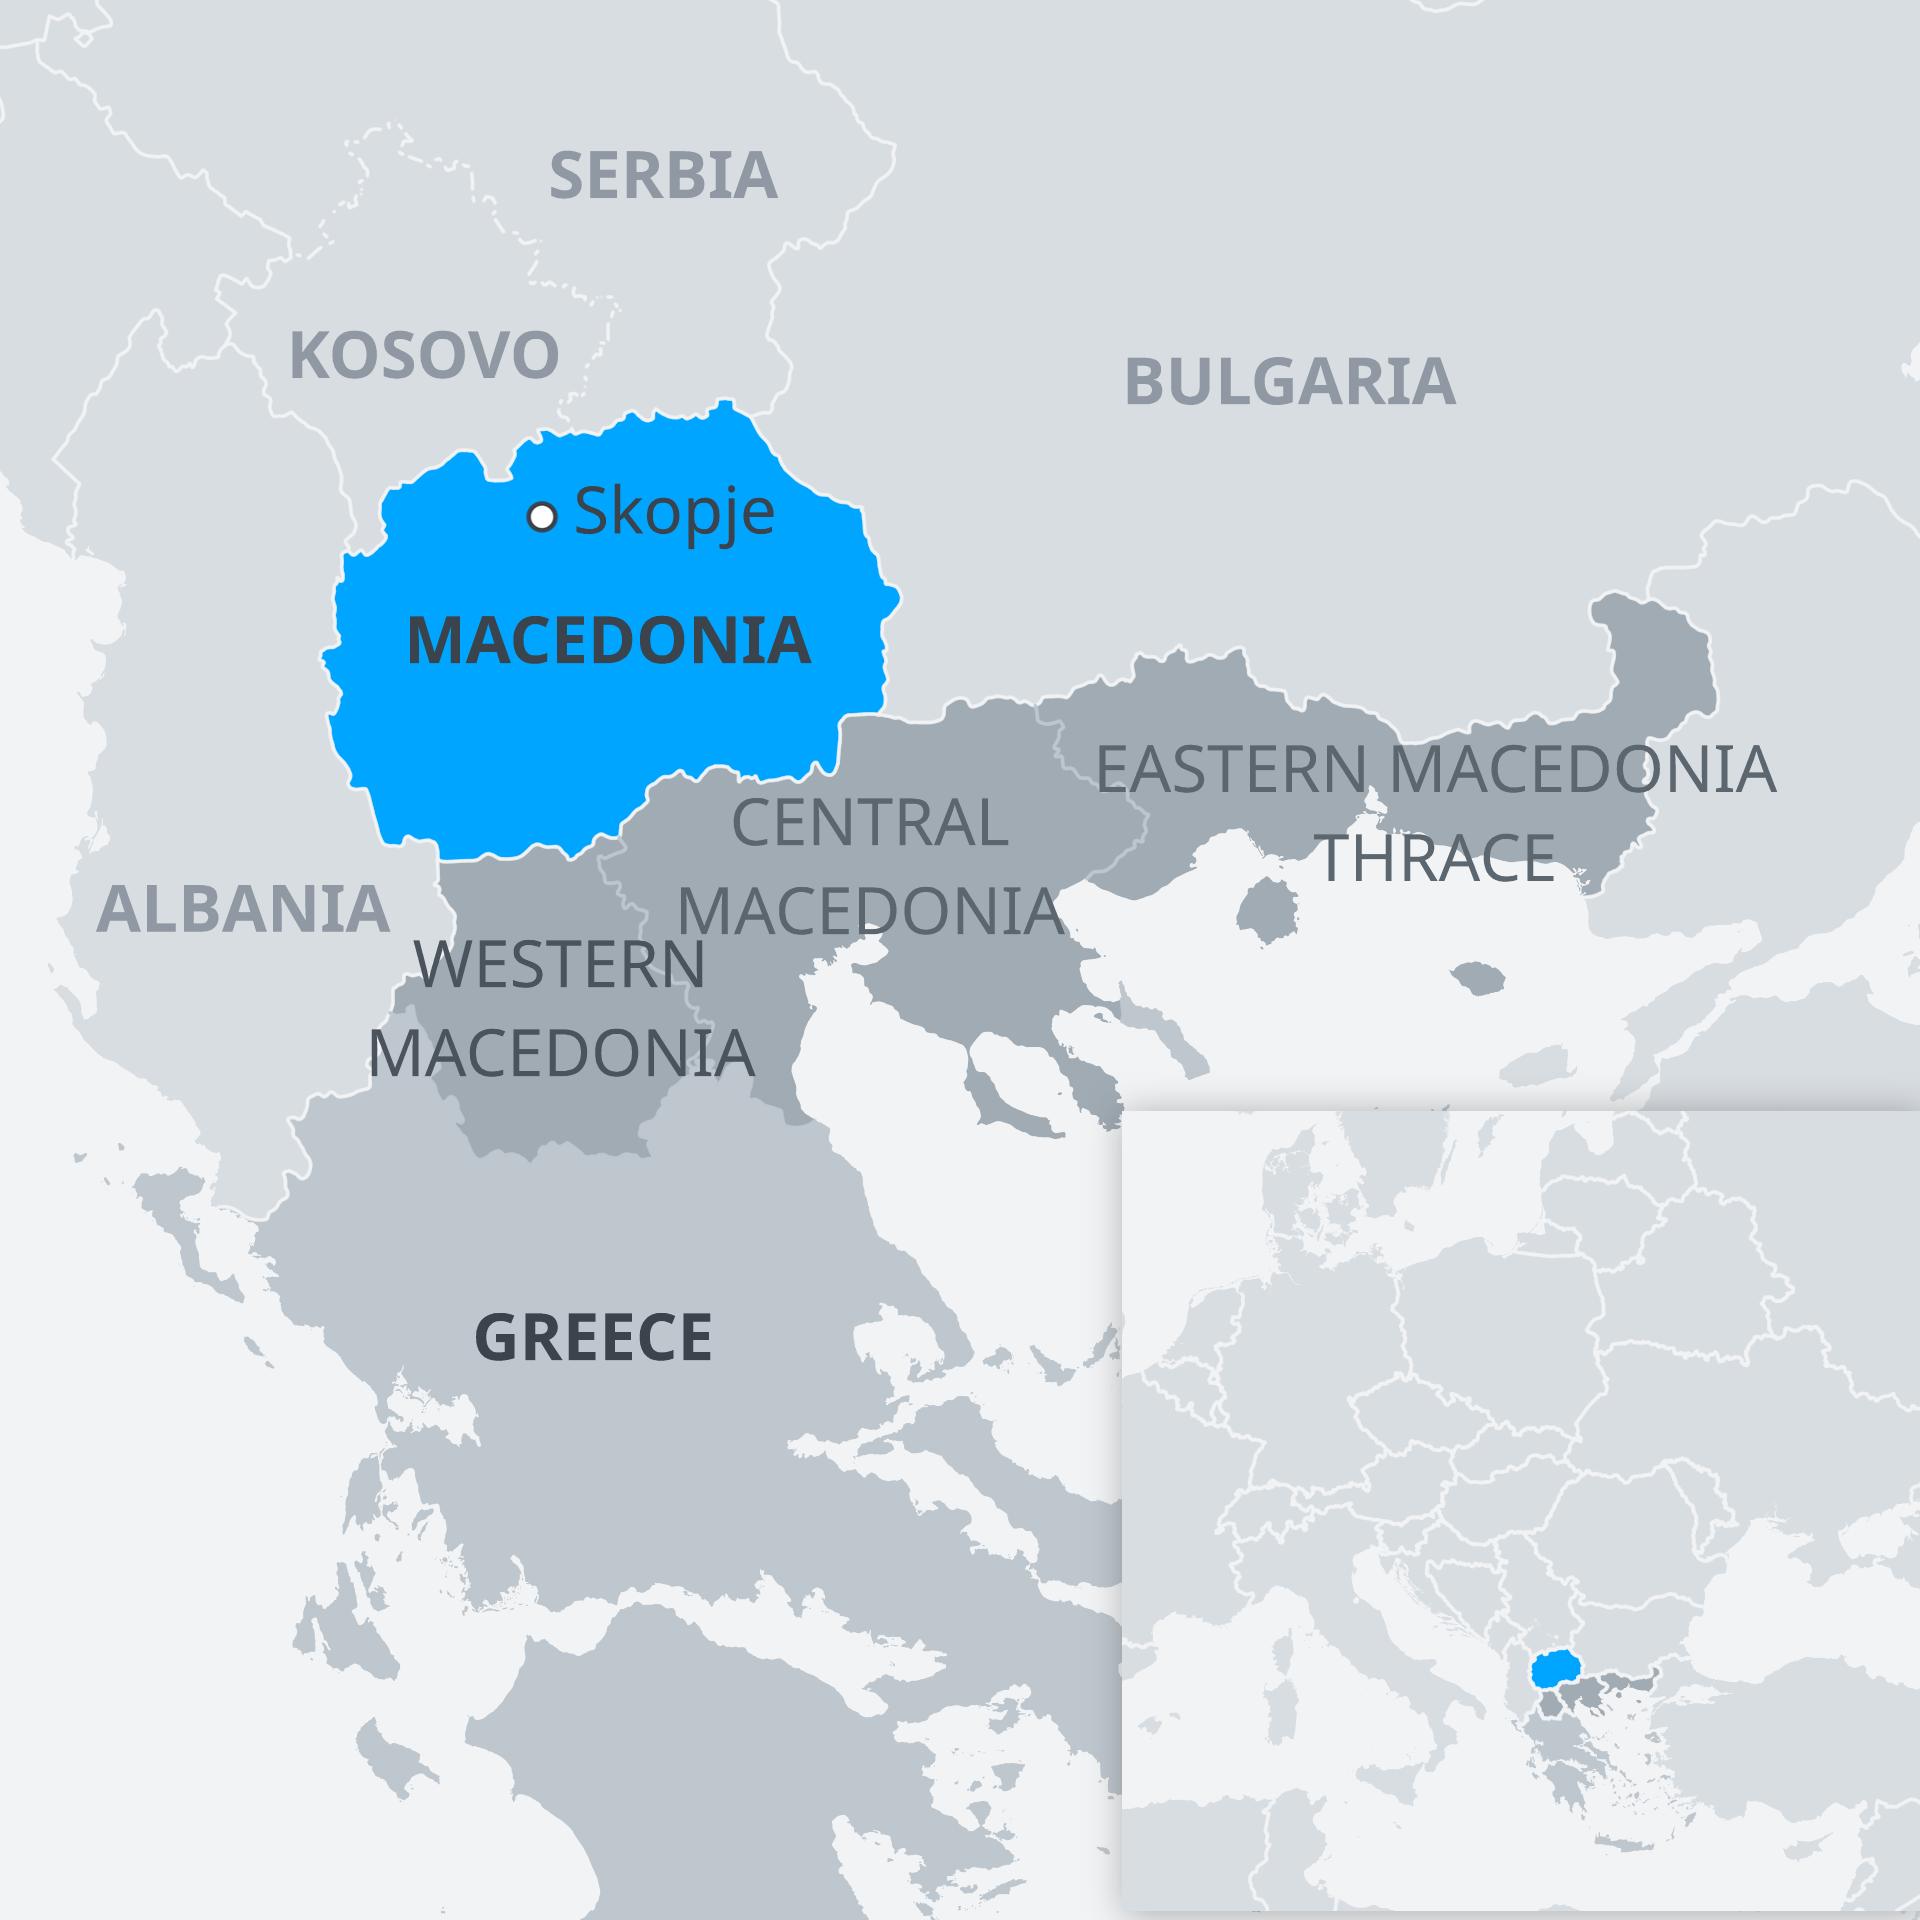 Dating Σκόπια Μακεδονία ακρίβεια του υπερήχων dating εγκυμοσύνη